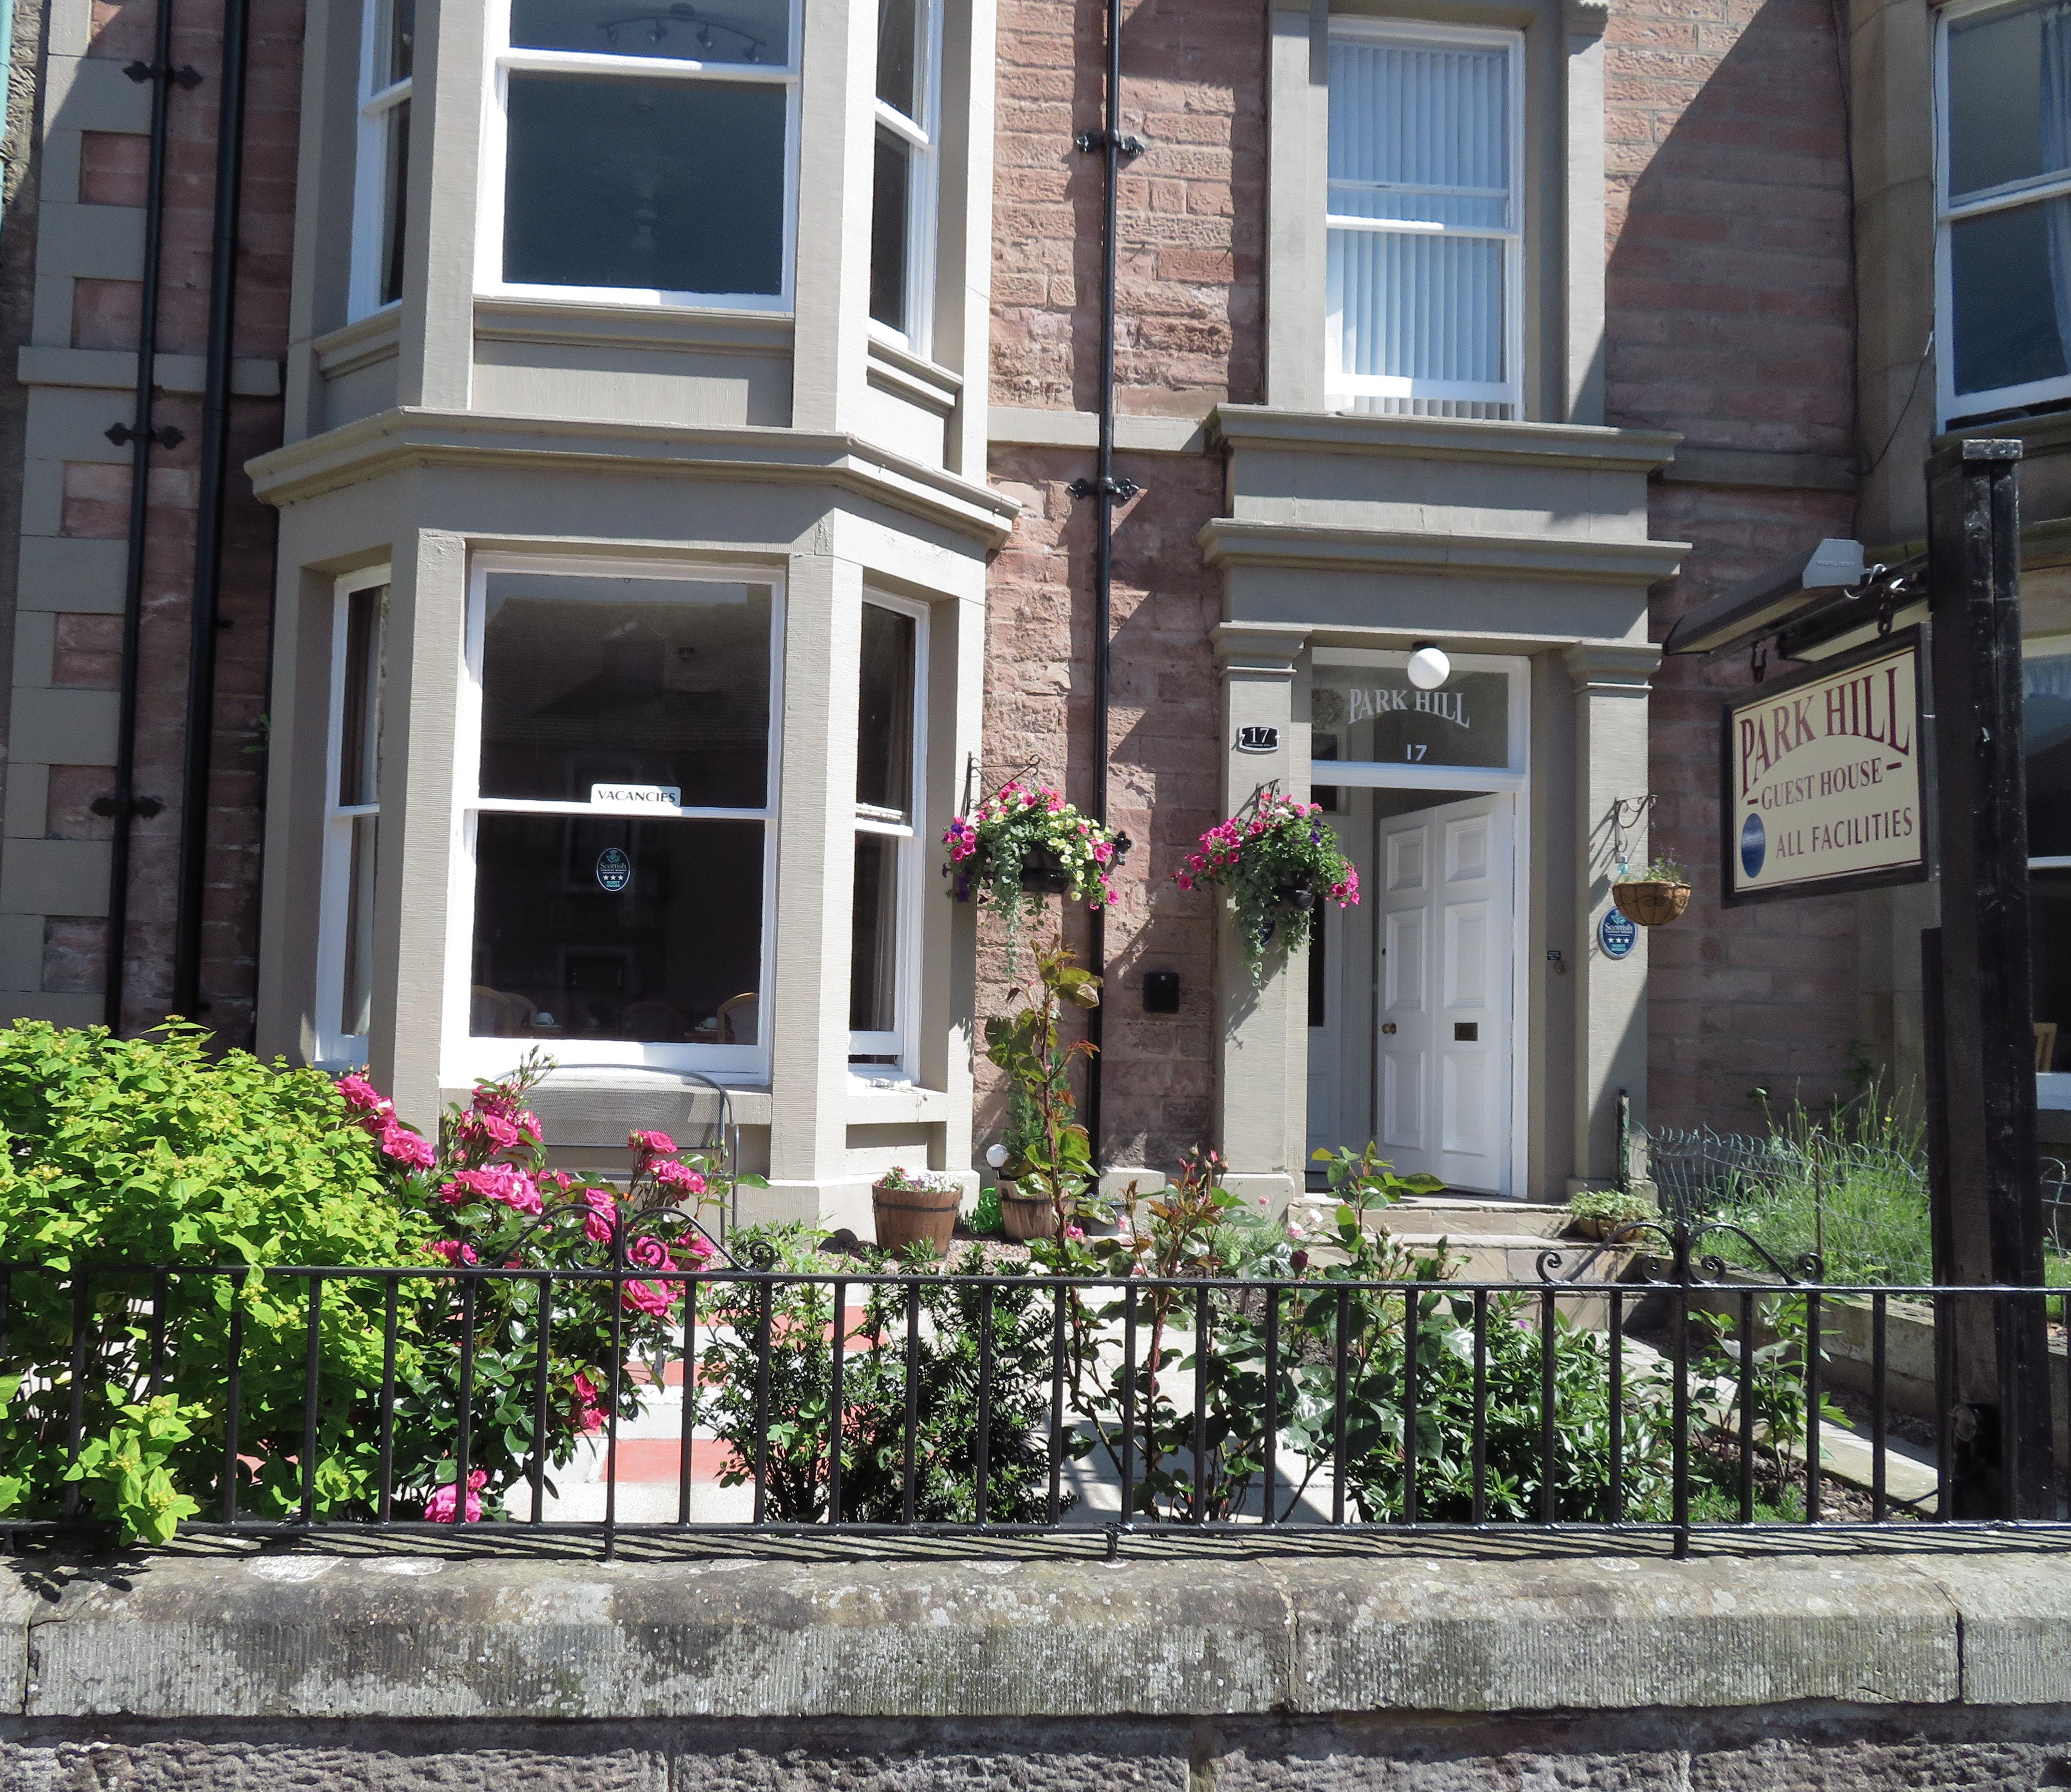 Parkhill Guest House